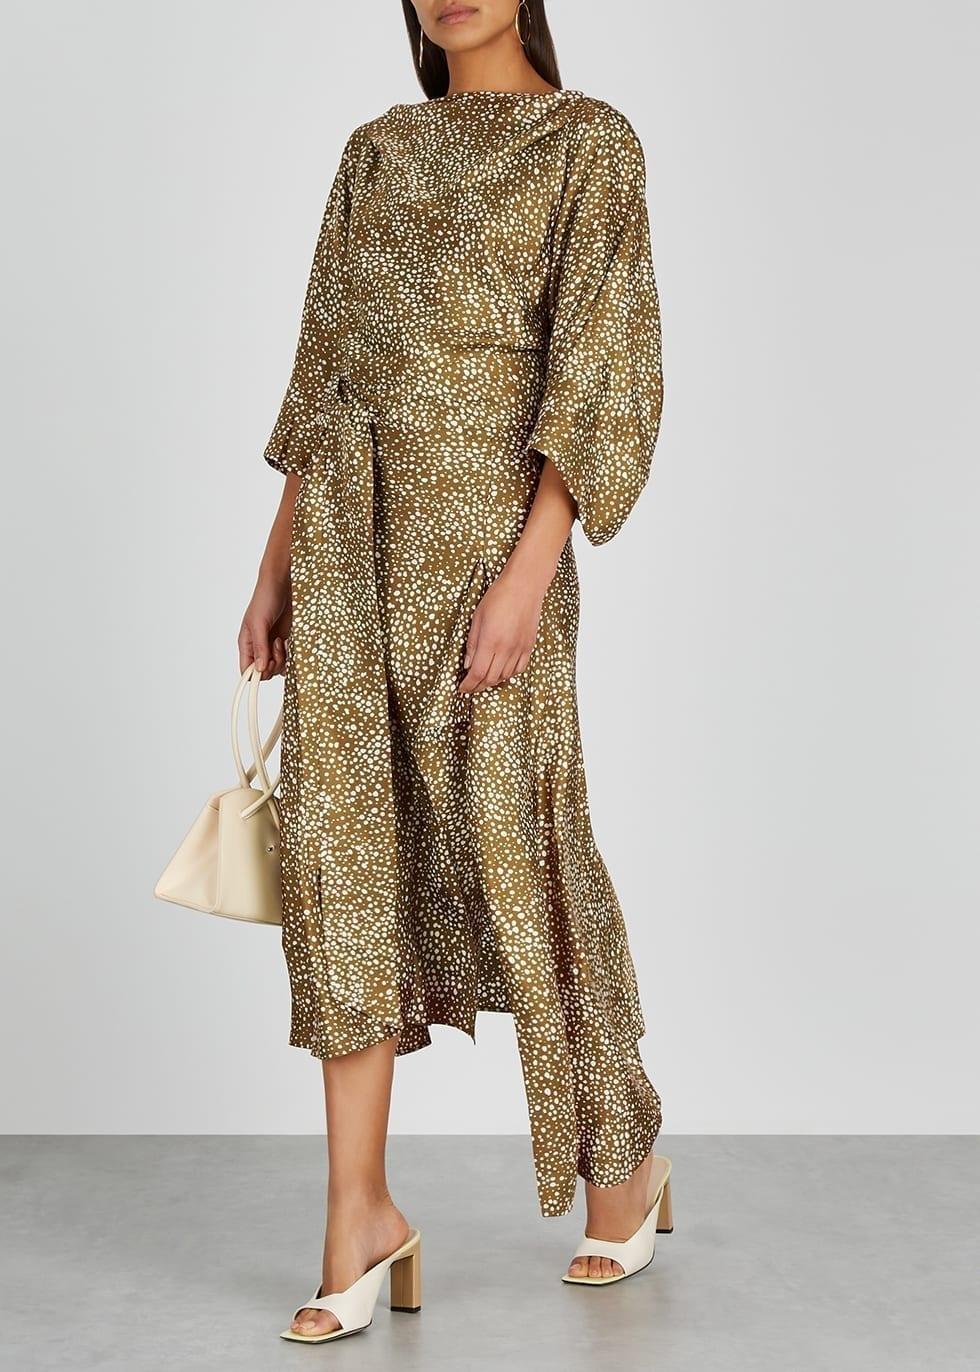 PETAR PETROV Agatha Printed Silk Midi Dress